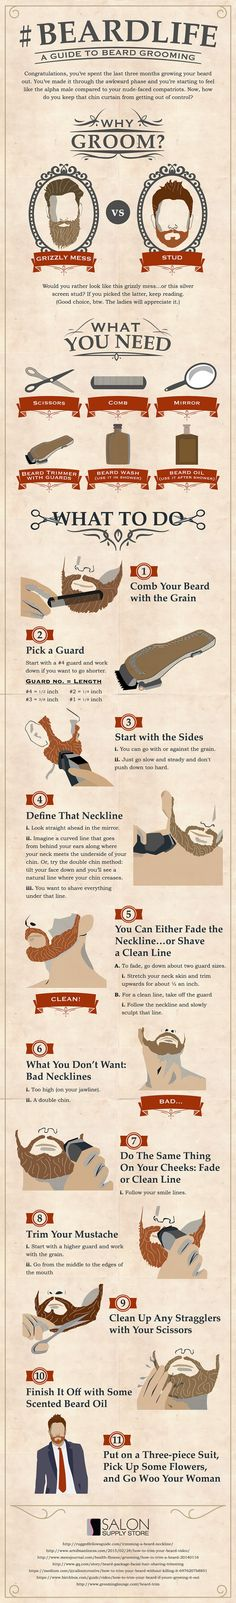 #Beardlife - A Guide To Beard Grooming